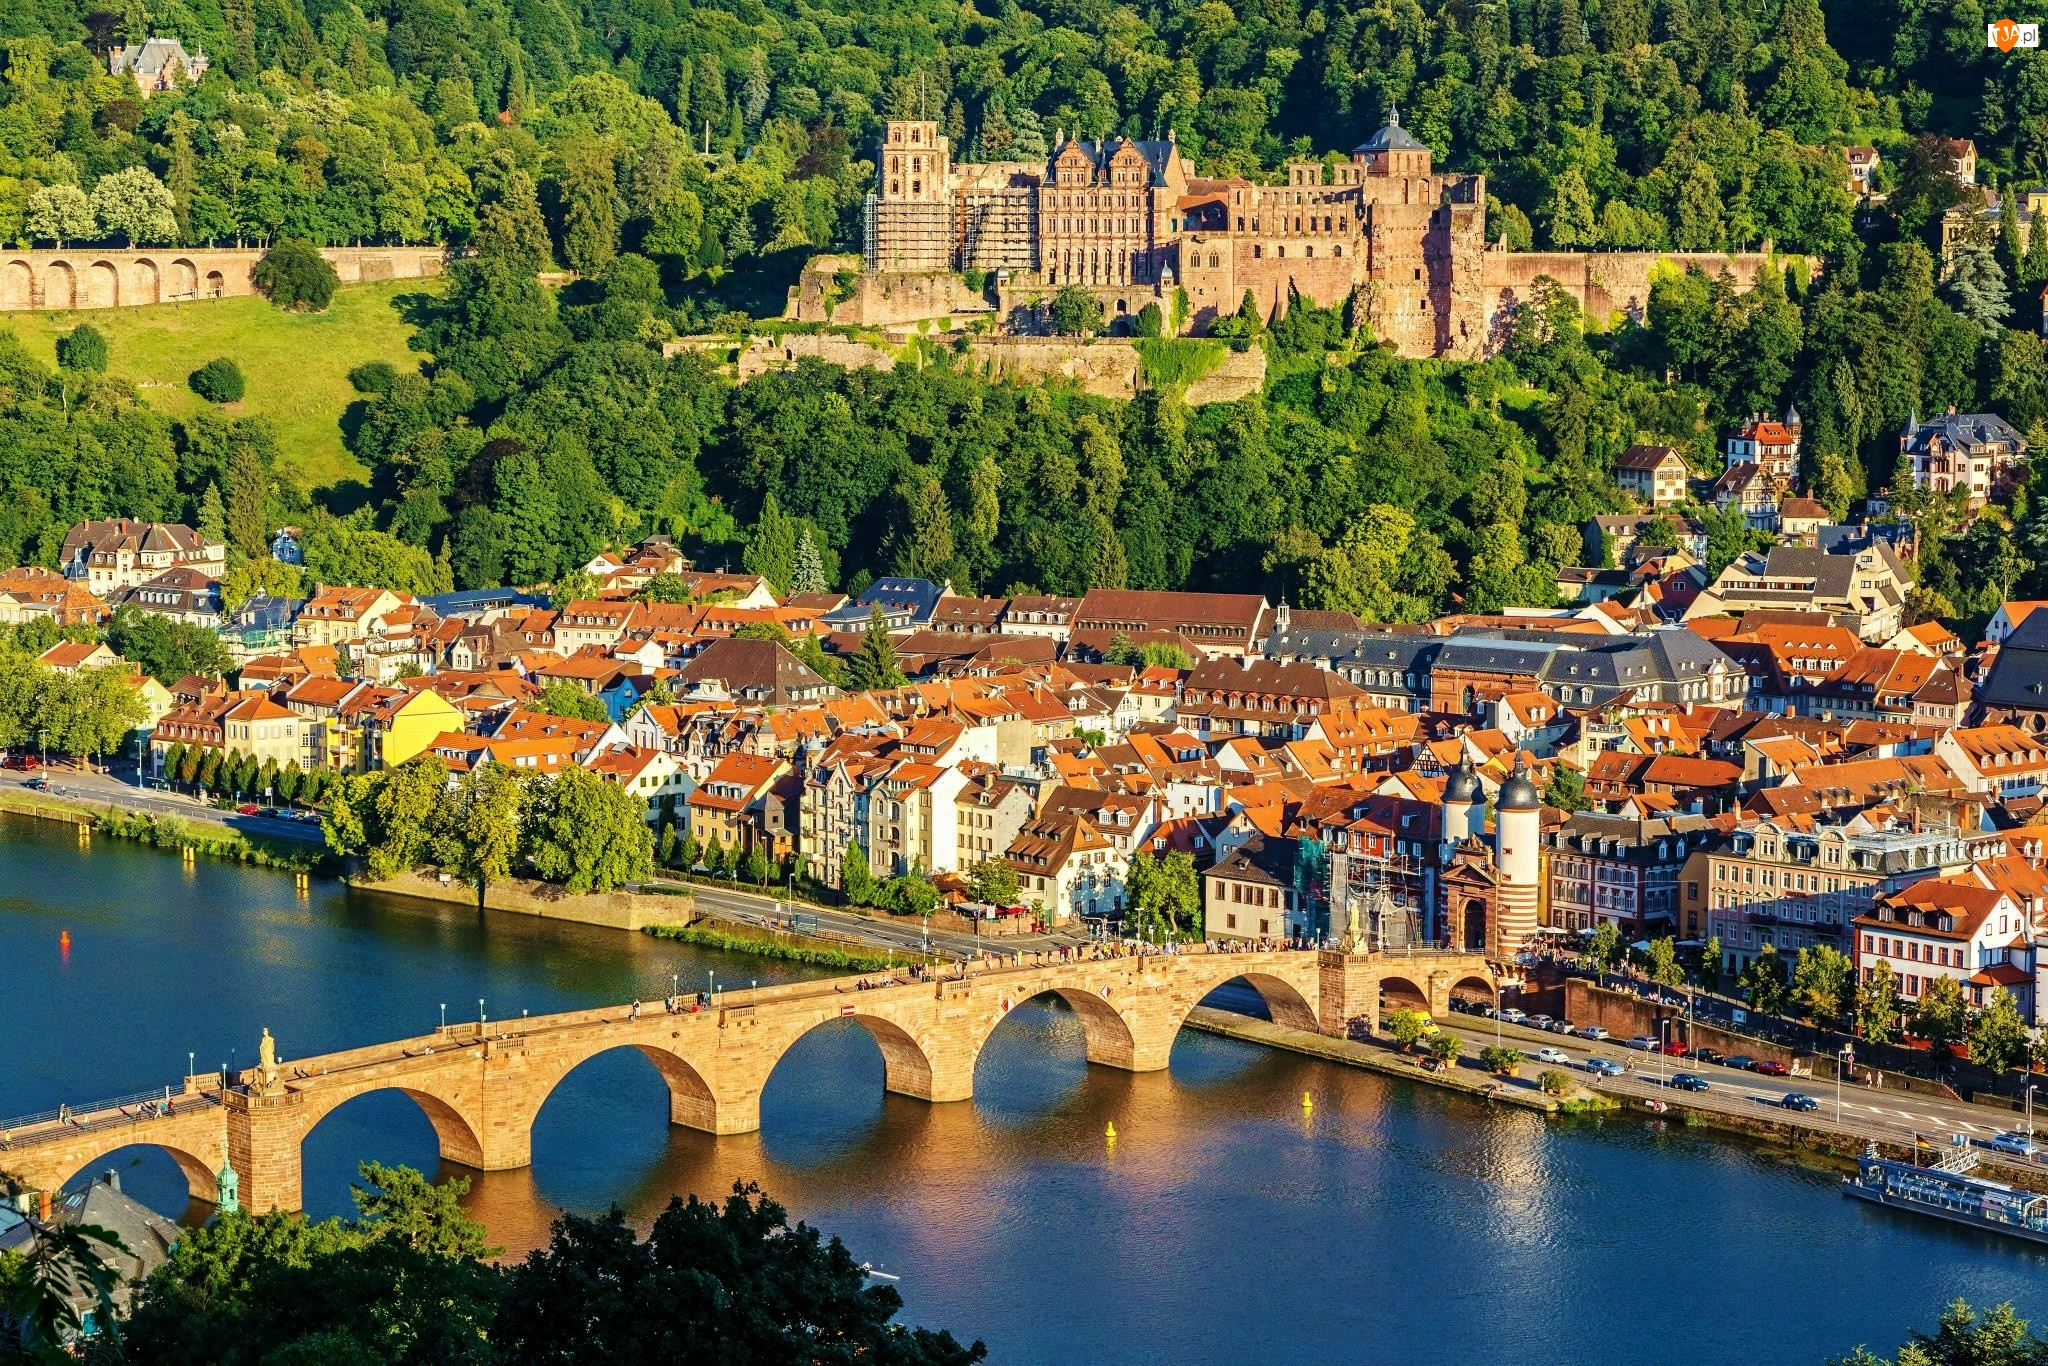 Heidelberger Schloss, Zamek w Heidelbergu, Niemcy, Rzeka Neckar, Heidelberg, Most